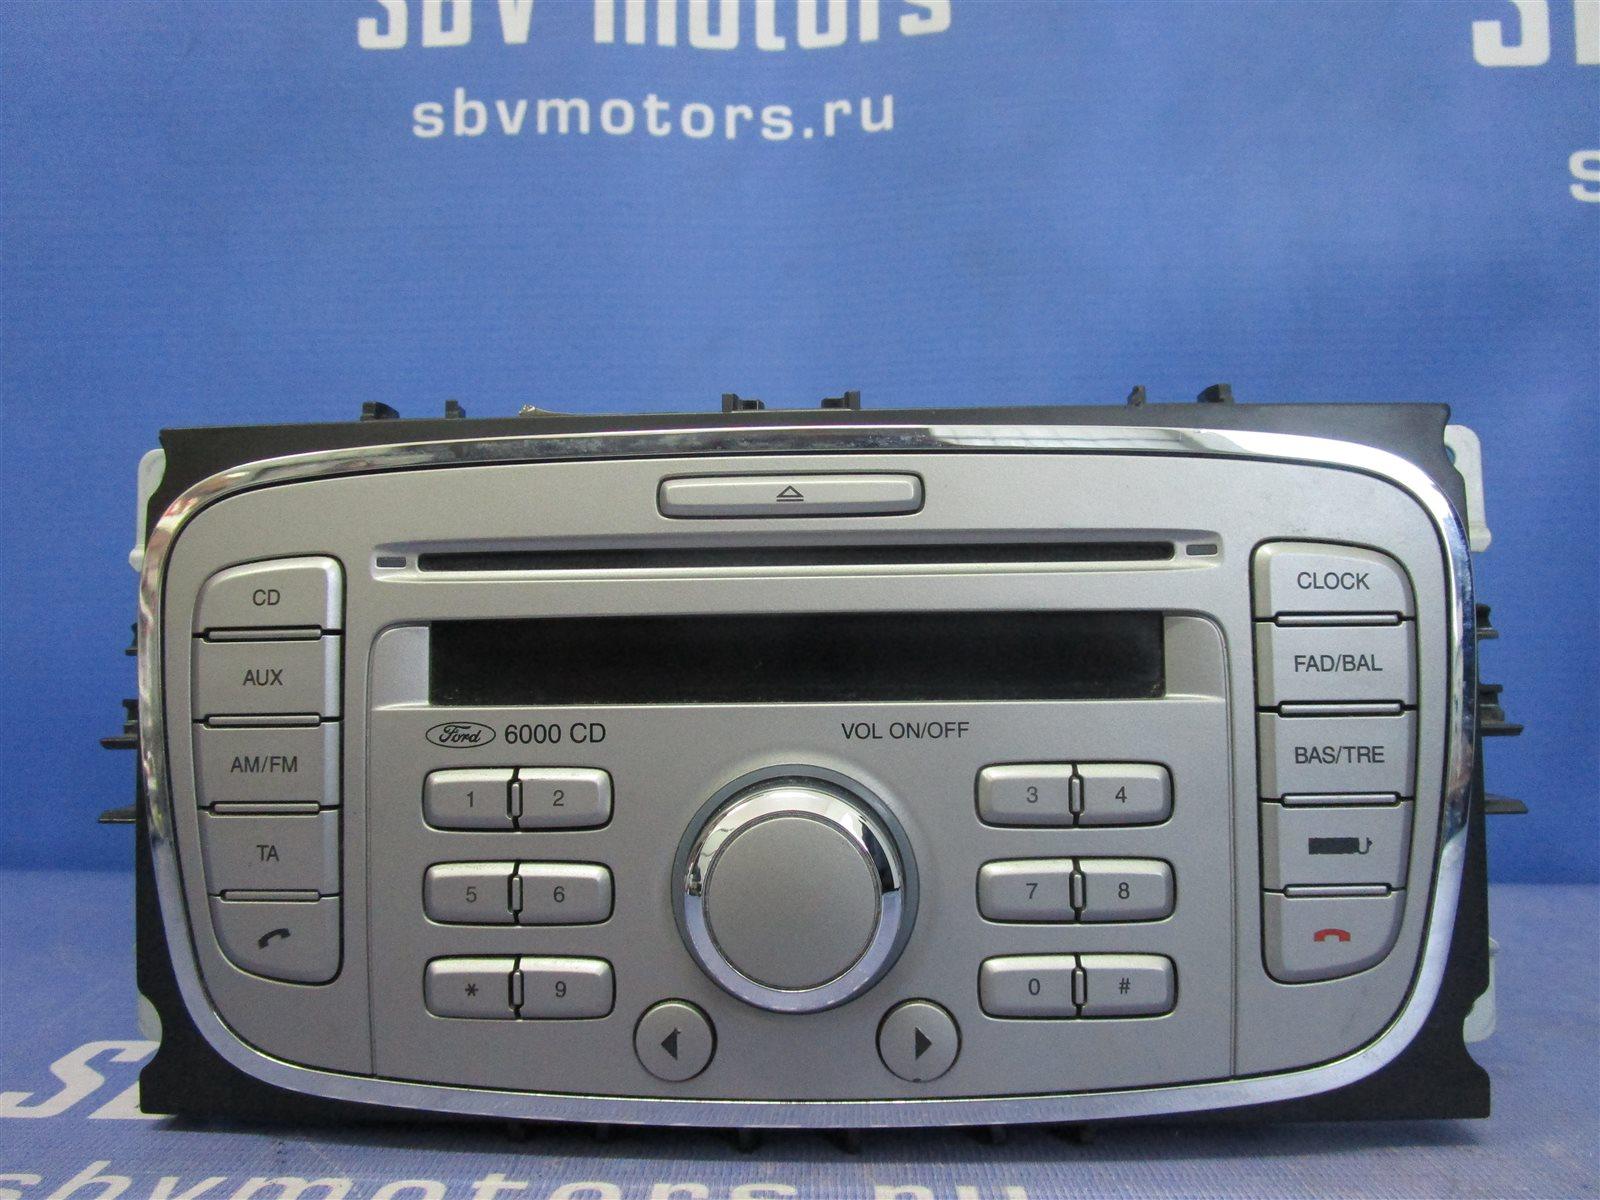 Магнитола , радио Ford Focus CB4 2009г.